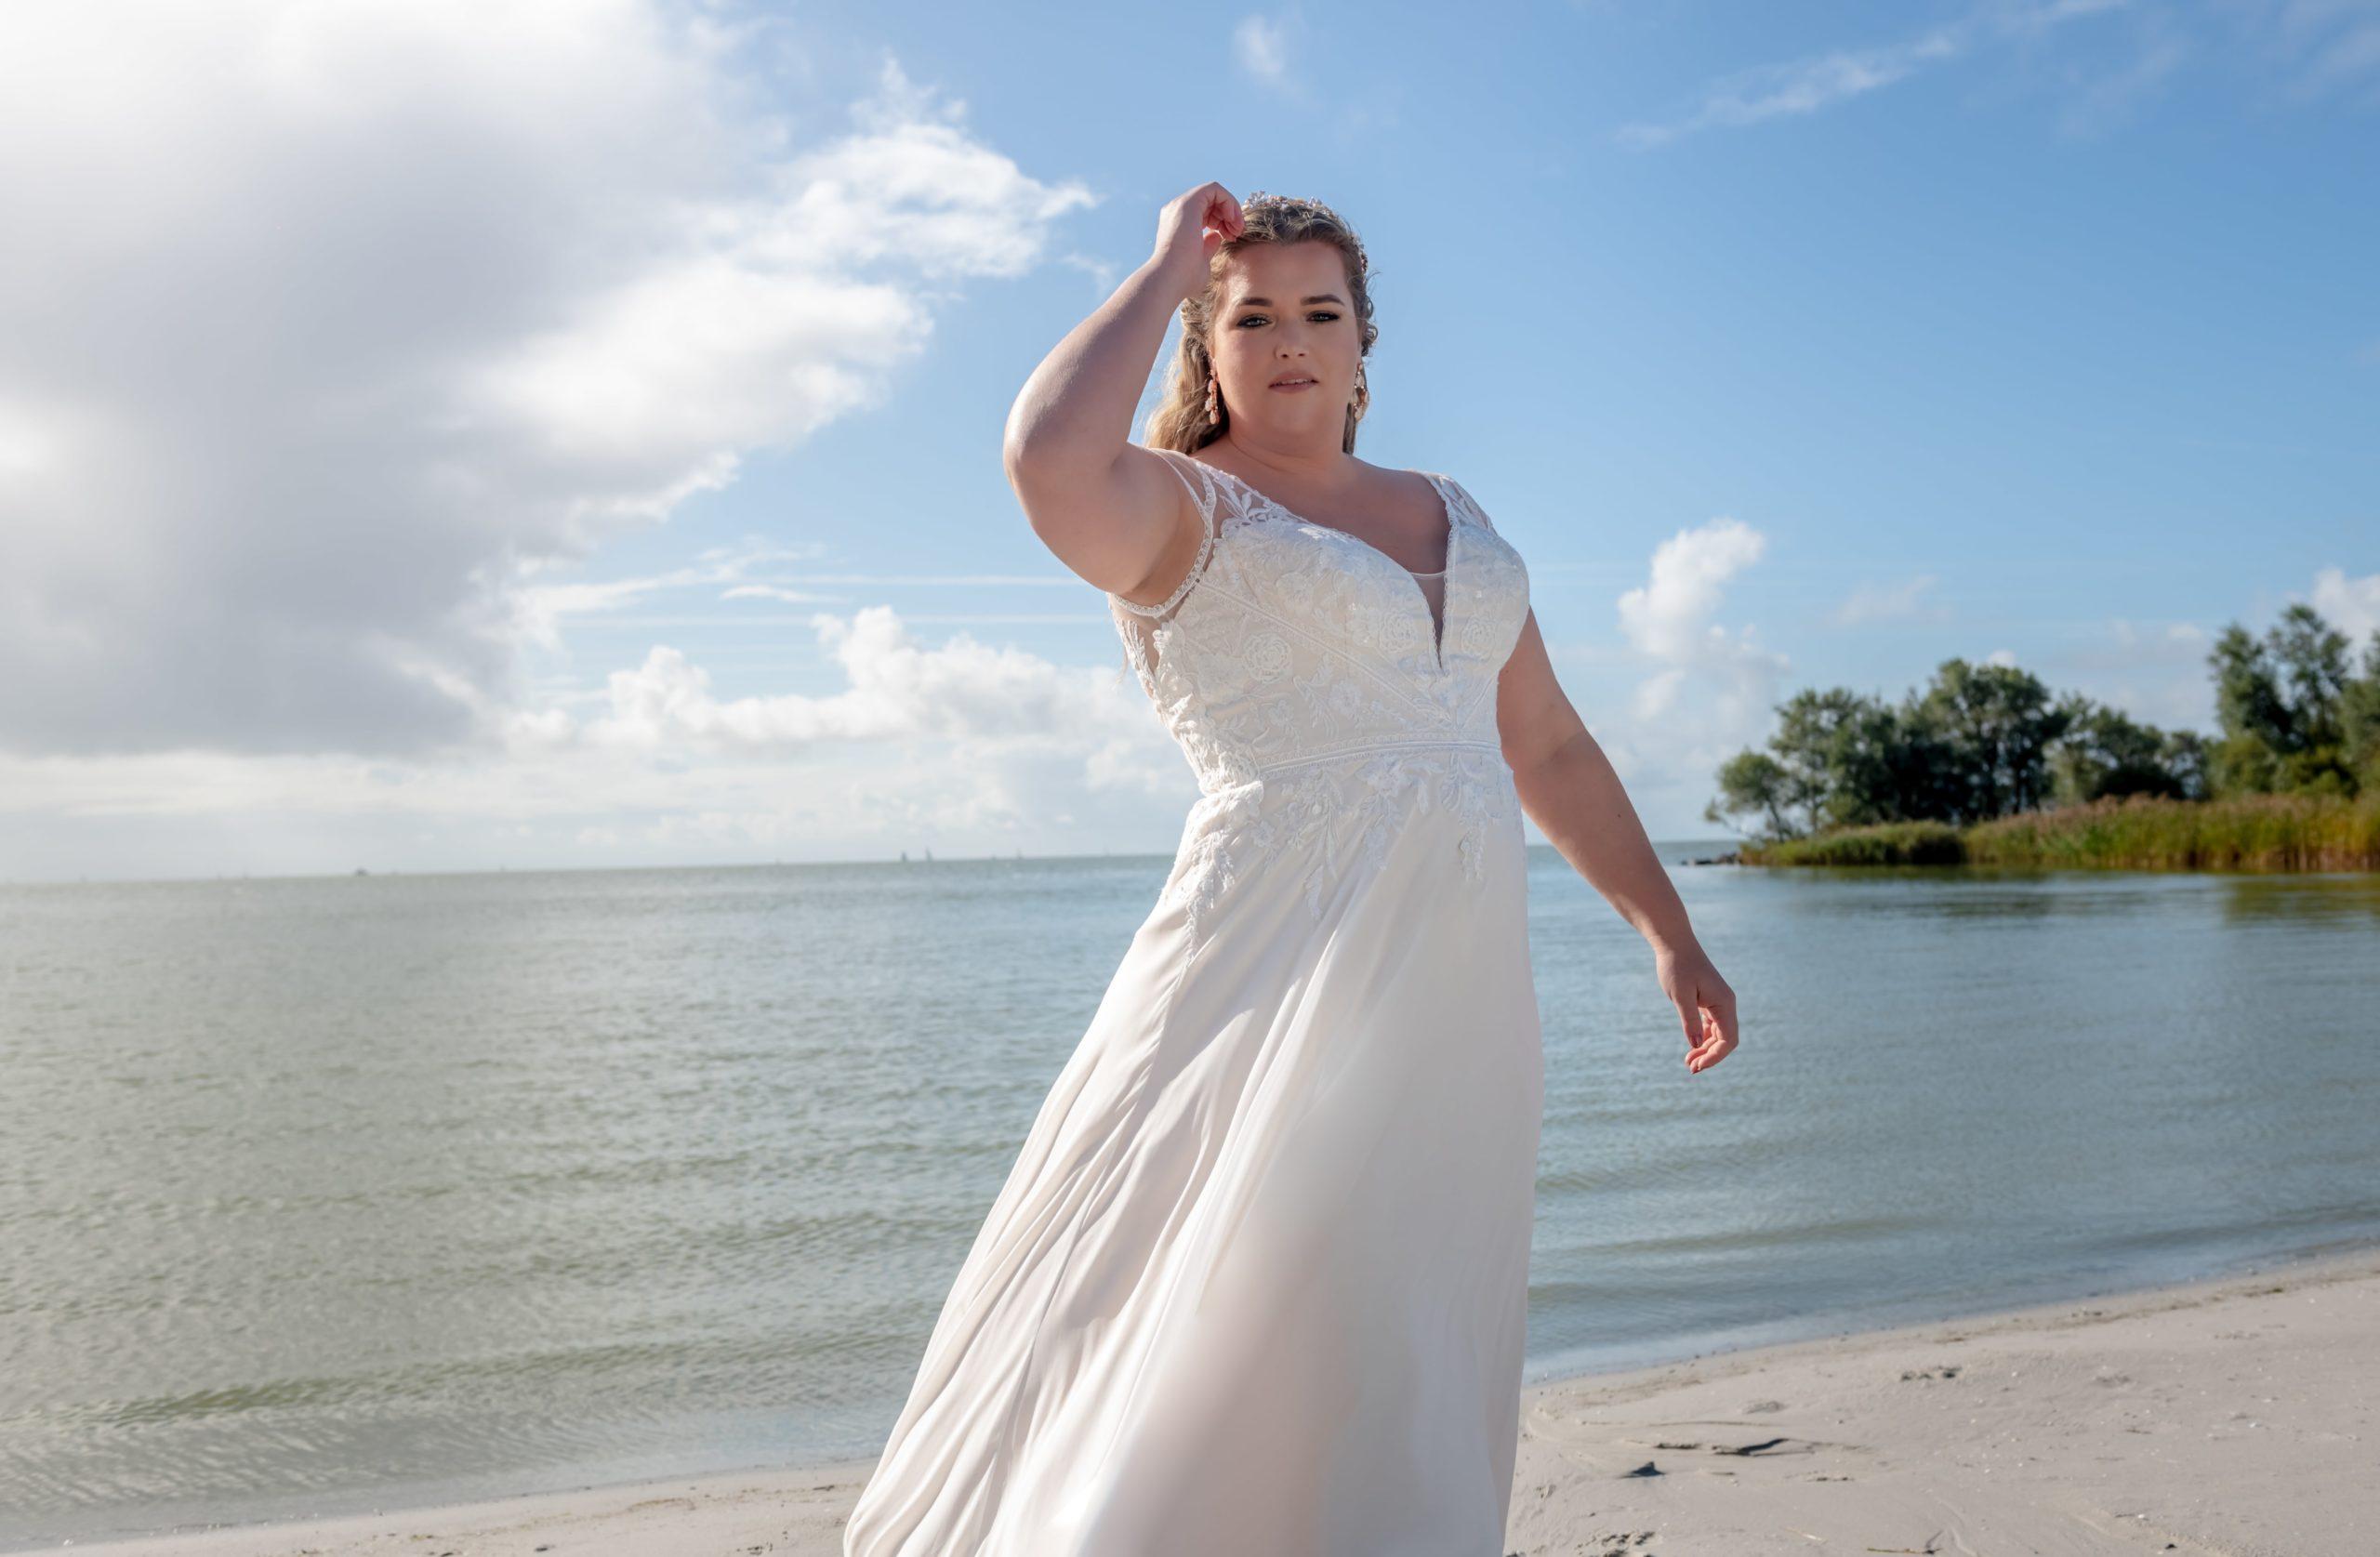 brautatelier ried-curvy bride collection-bridalstar-Guusje-vintage-detail-panorama-1-min